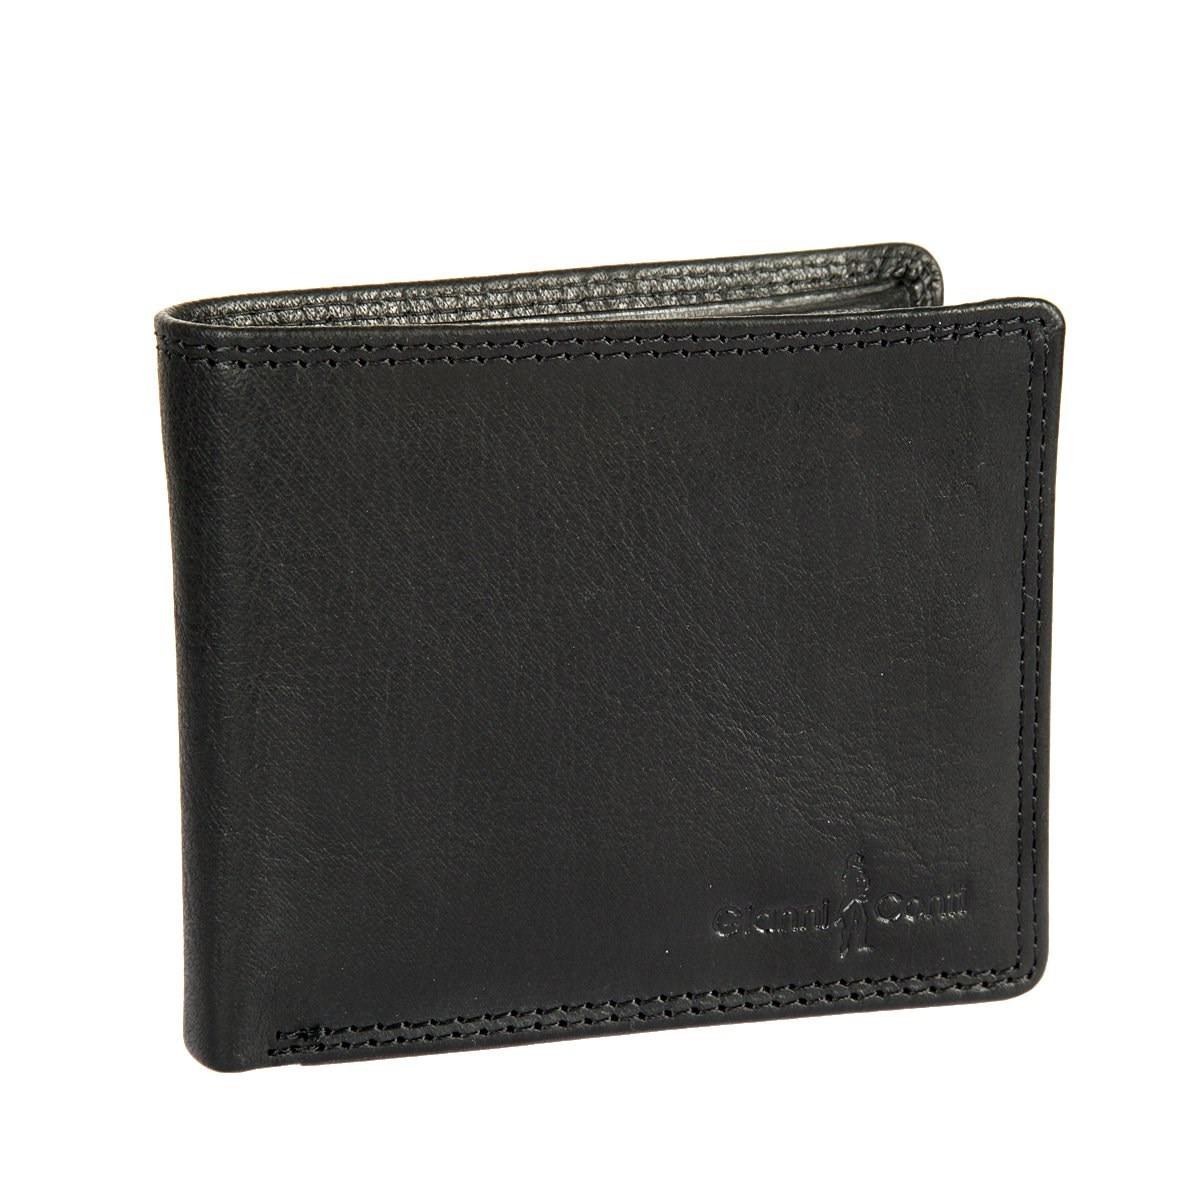 Coin Purse Gianni Conti 1077111 black 2017 hottest women short design gradient color coin purse cute ladies wallet bags pu leather handbags card holder clutch purse